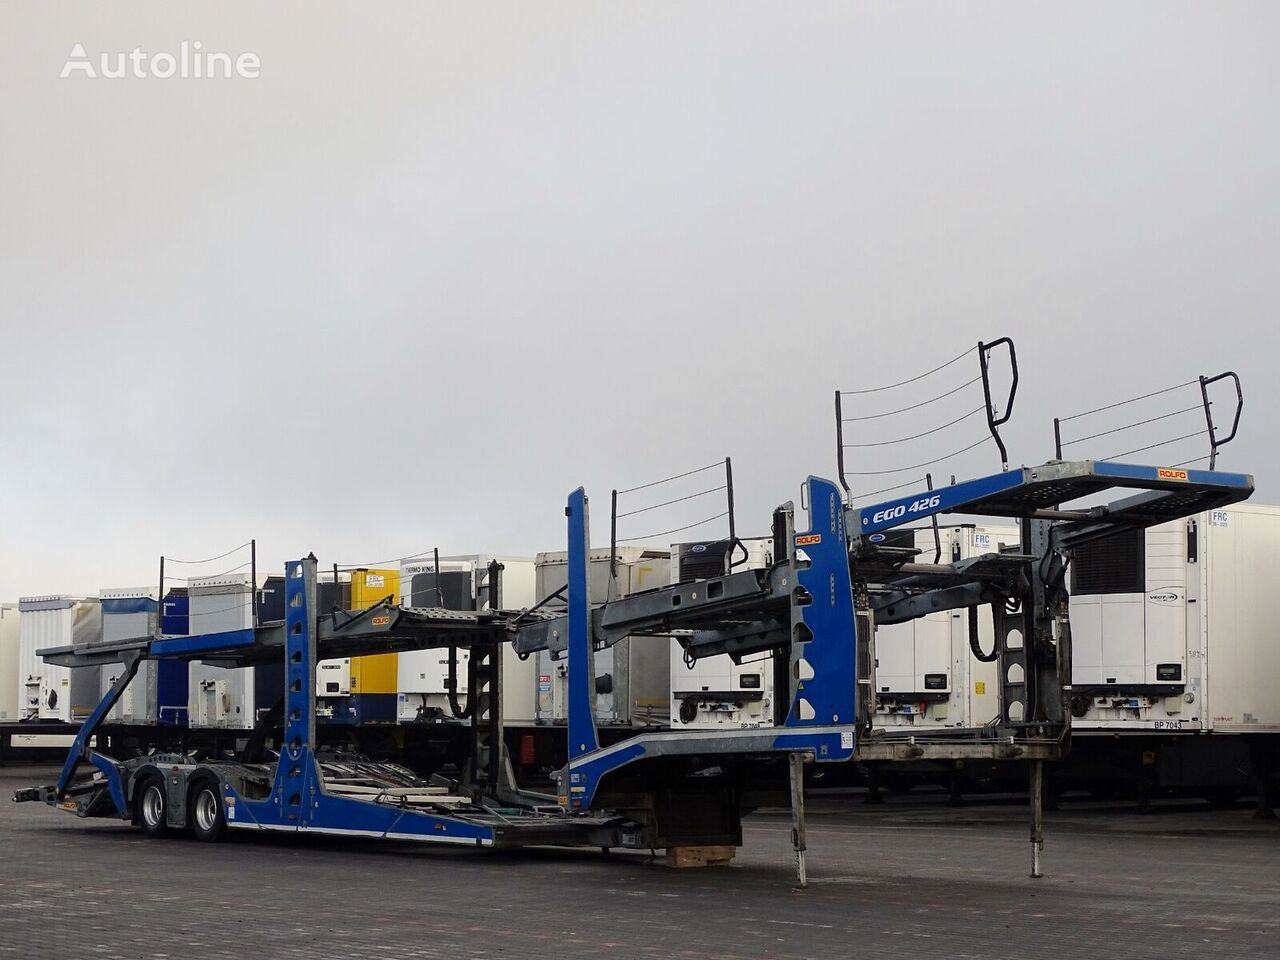 ROLFO EGO 426 / EURO LOHR / AUTOTRANSPORTER / 9 CARS /  semirremolque portacoches